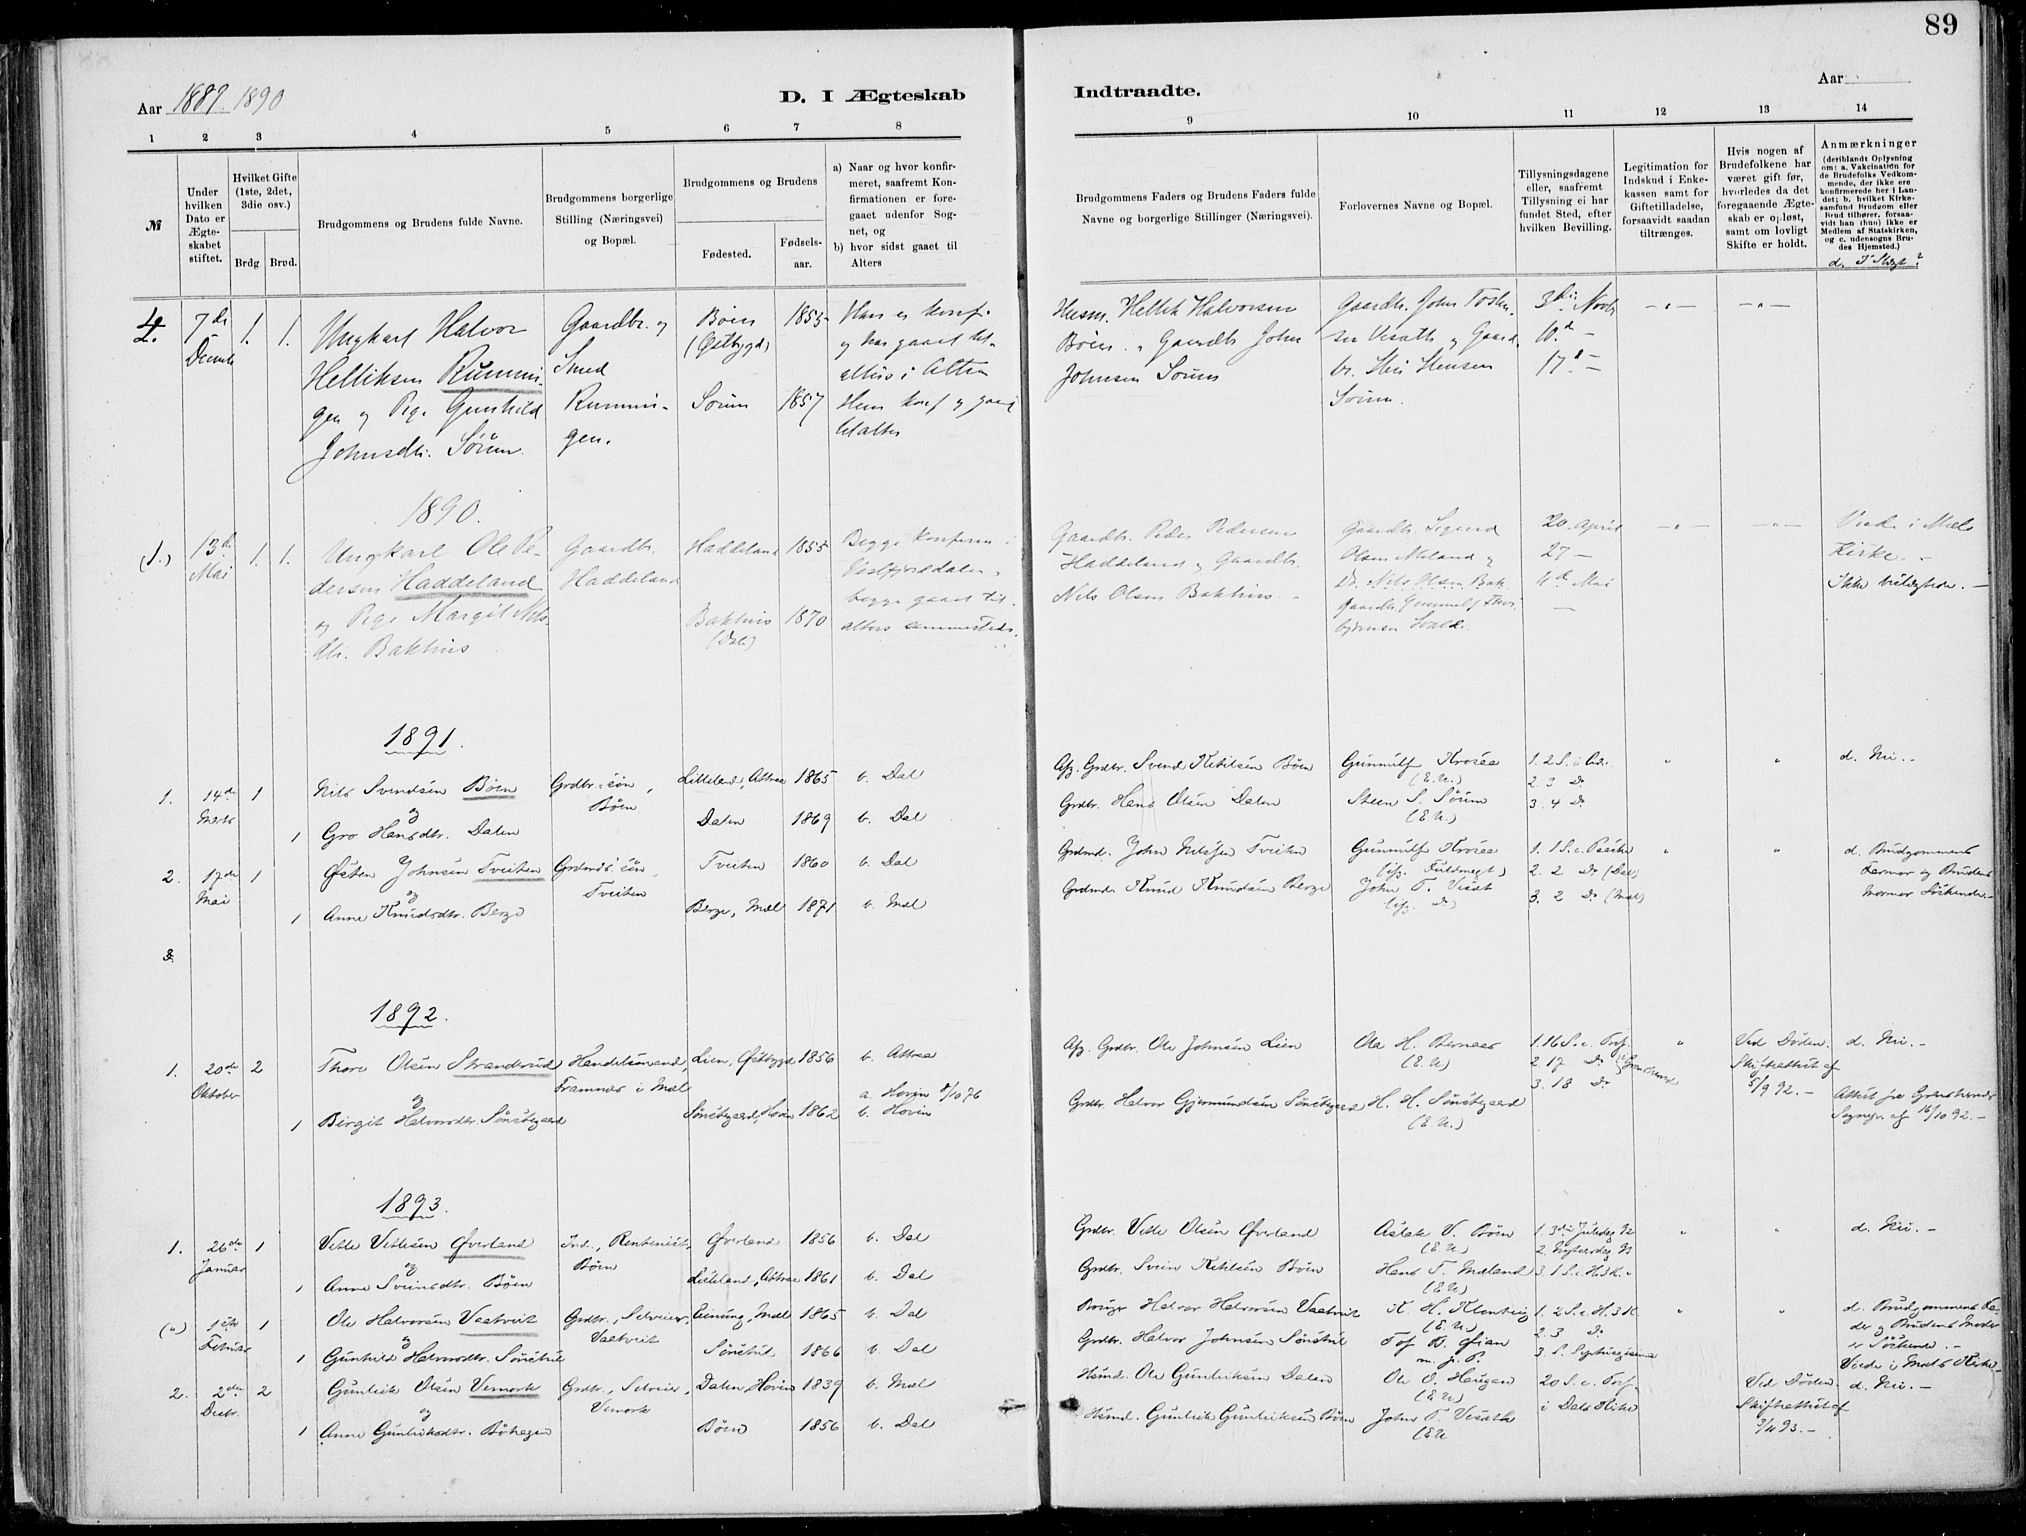 SAKO, Rjukan kirkebøker, F/Fa/L0001: Ministerialbok nr. 1, 1878-1912, s. 89